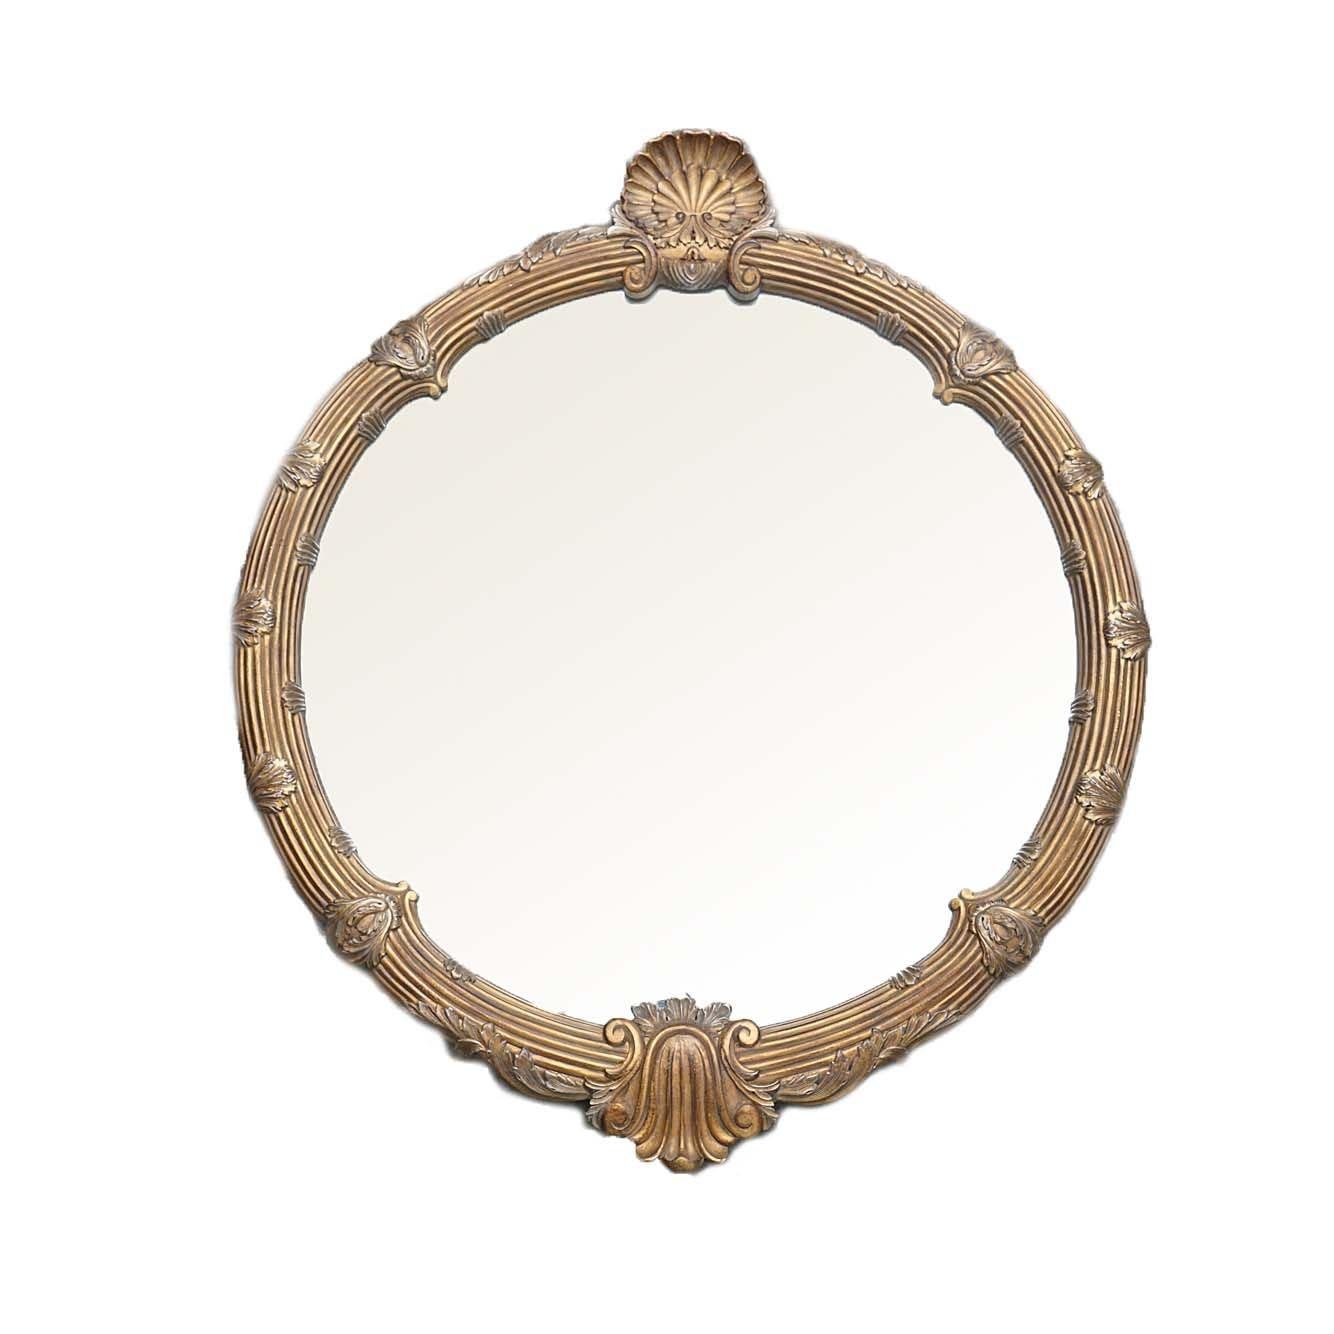 Contemporary Neoclassical Style Round Wall Mirror by Carolina Mirror Company